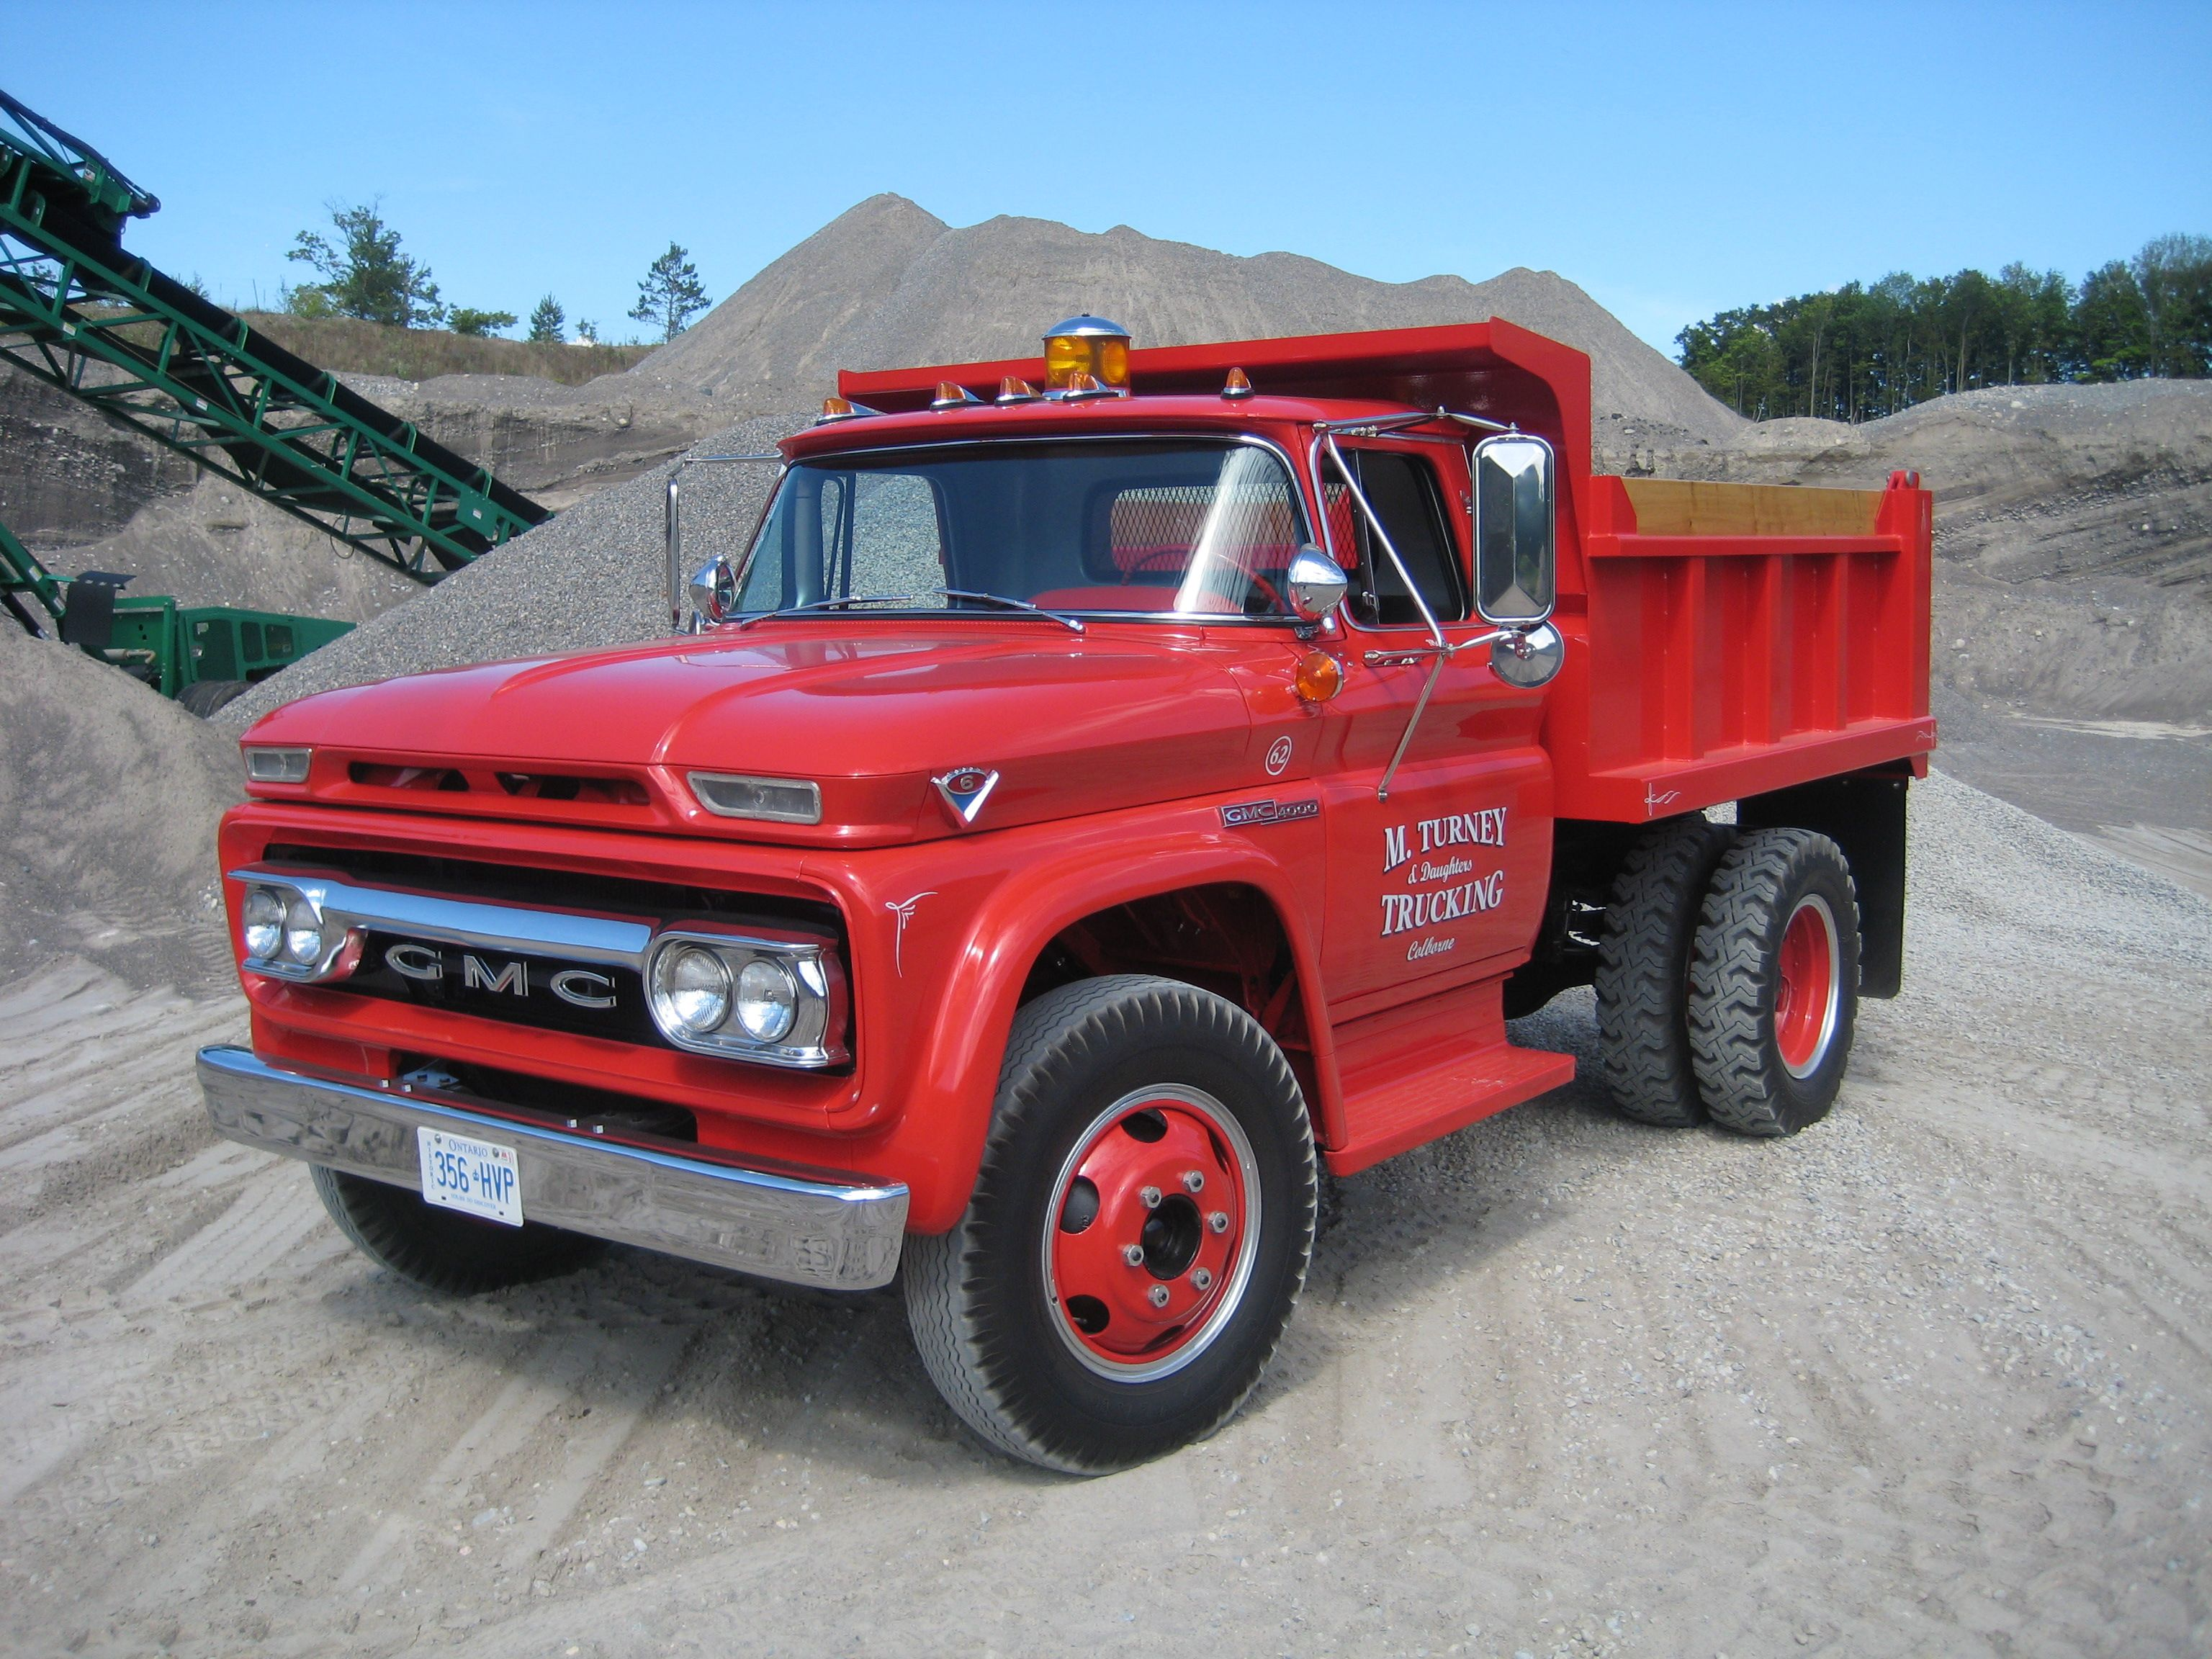 1962 Gmc Dump Truck Gmc Vehicles Trucks Gmc Trucks